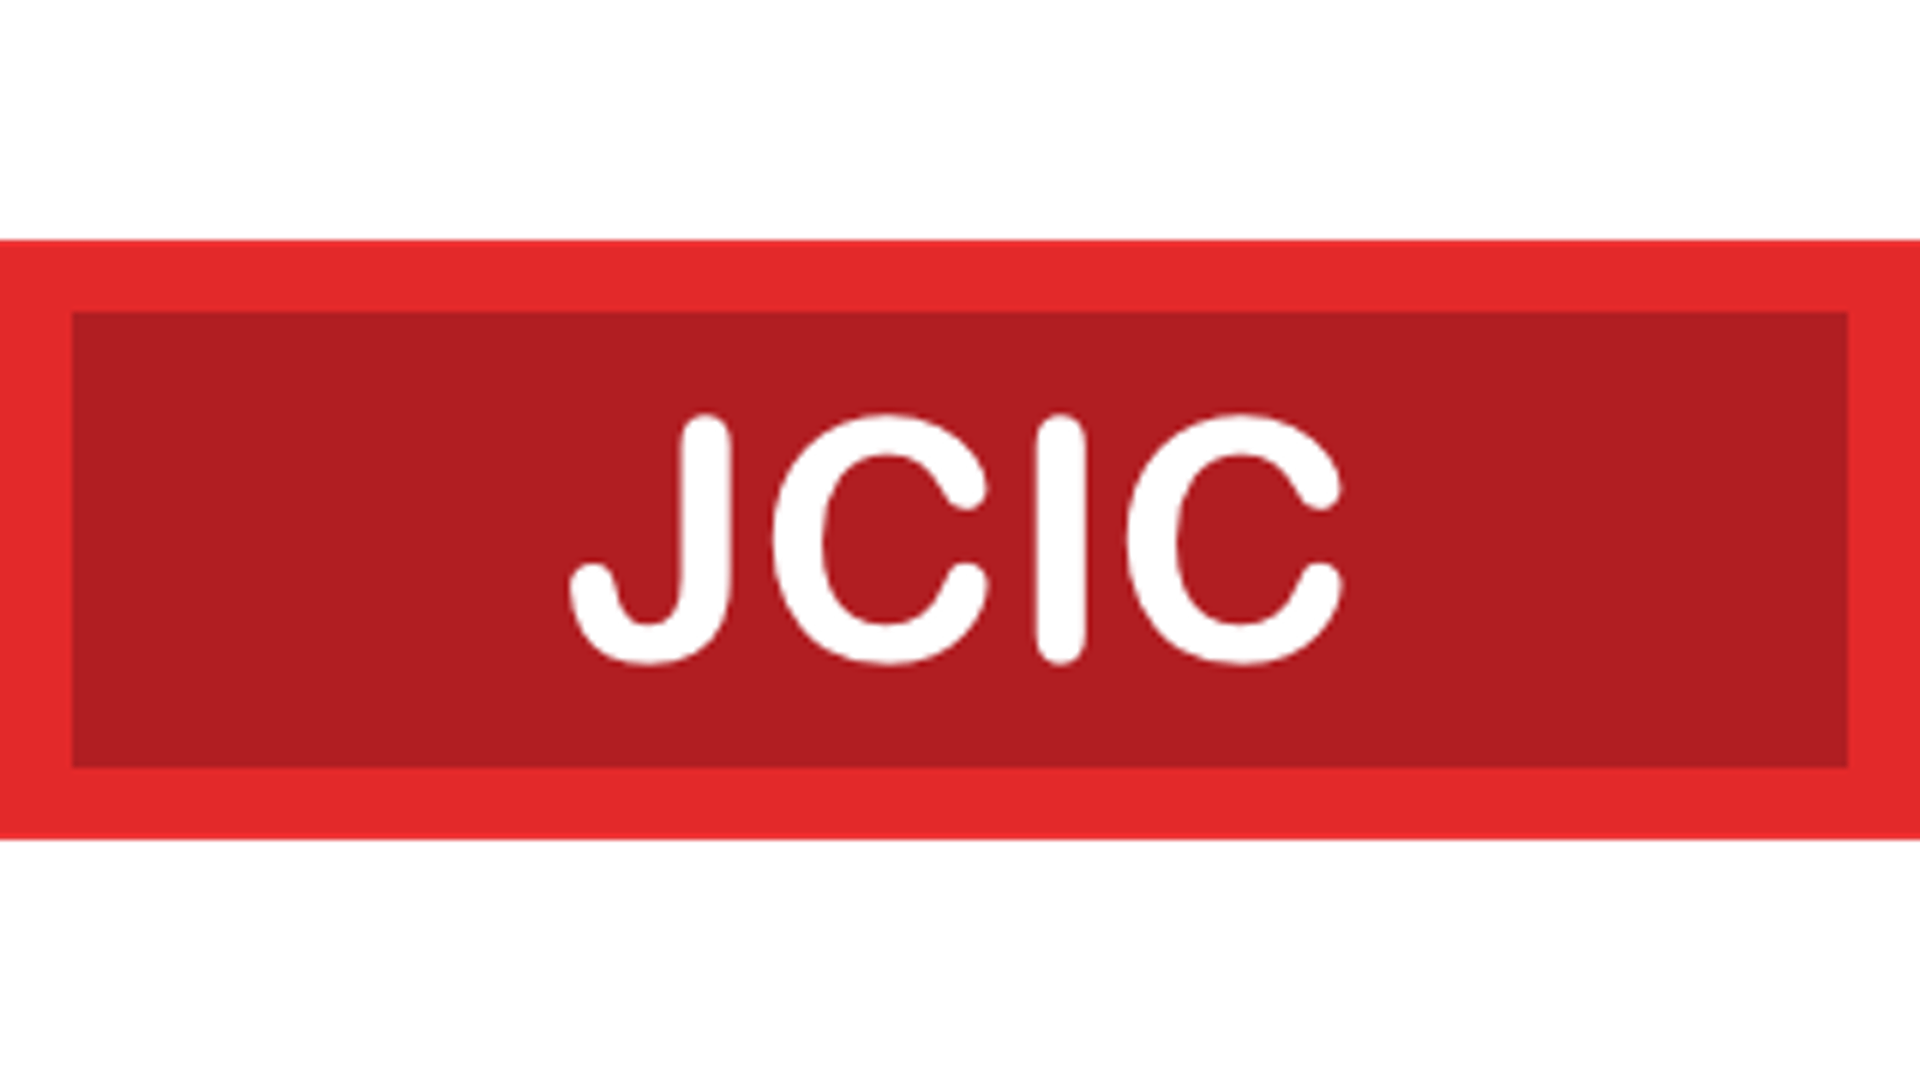 Jcic 2x